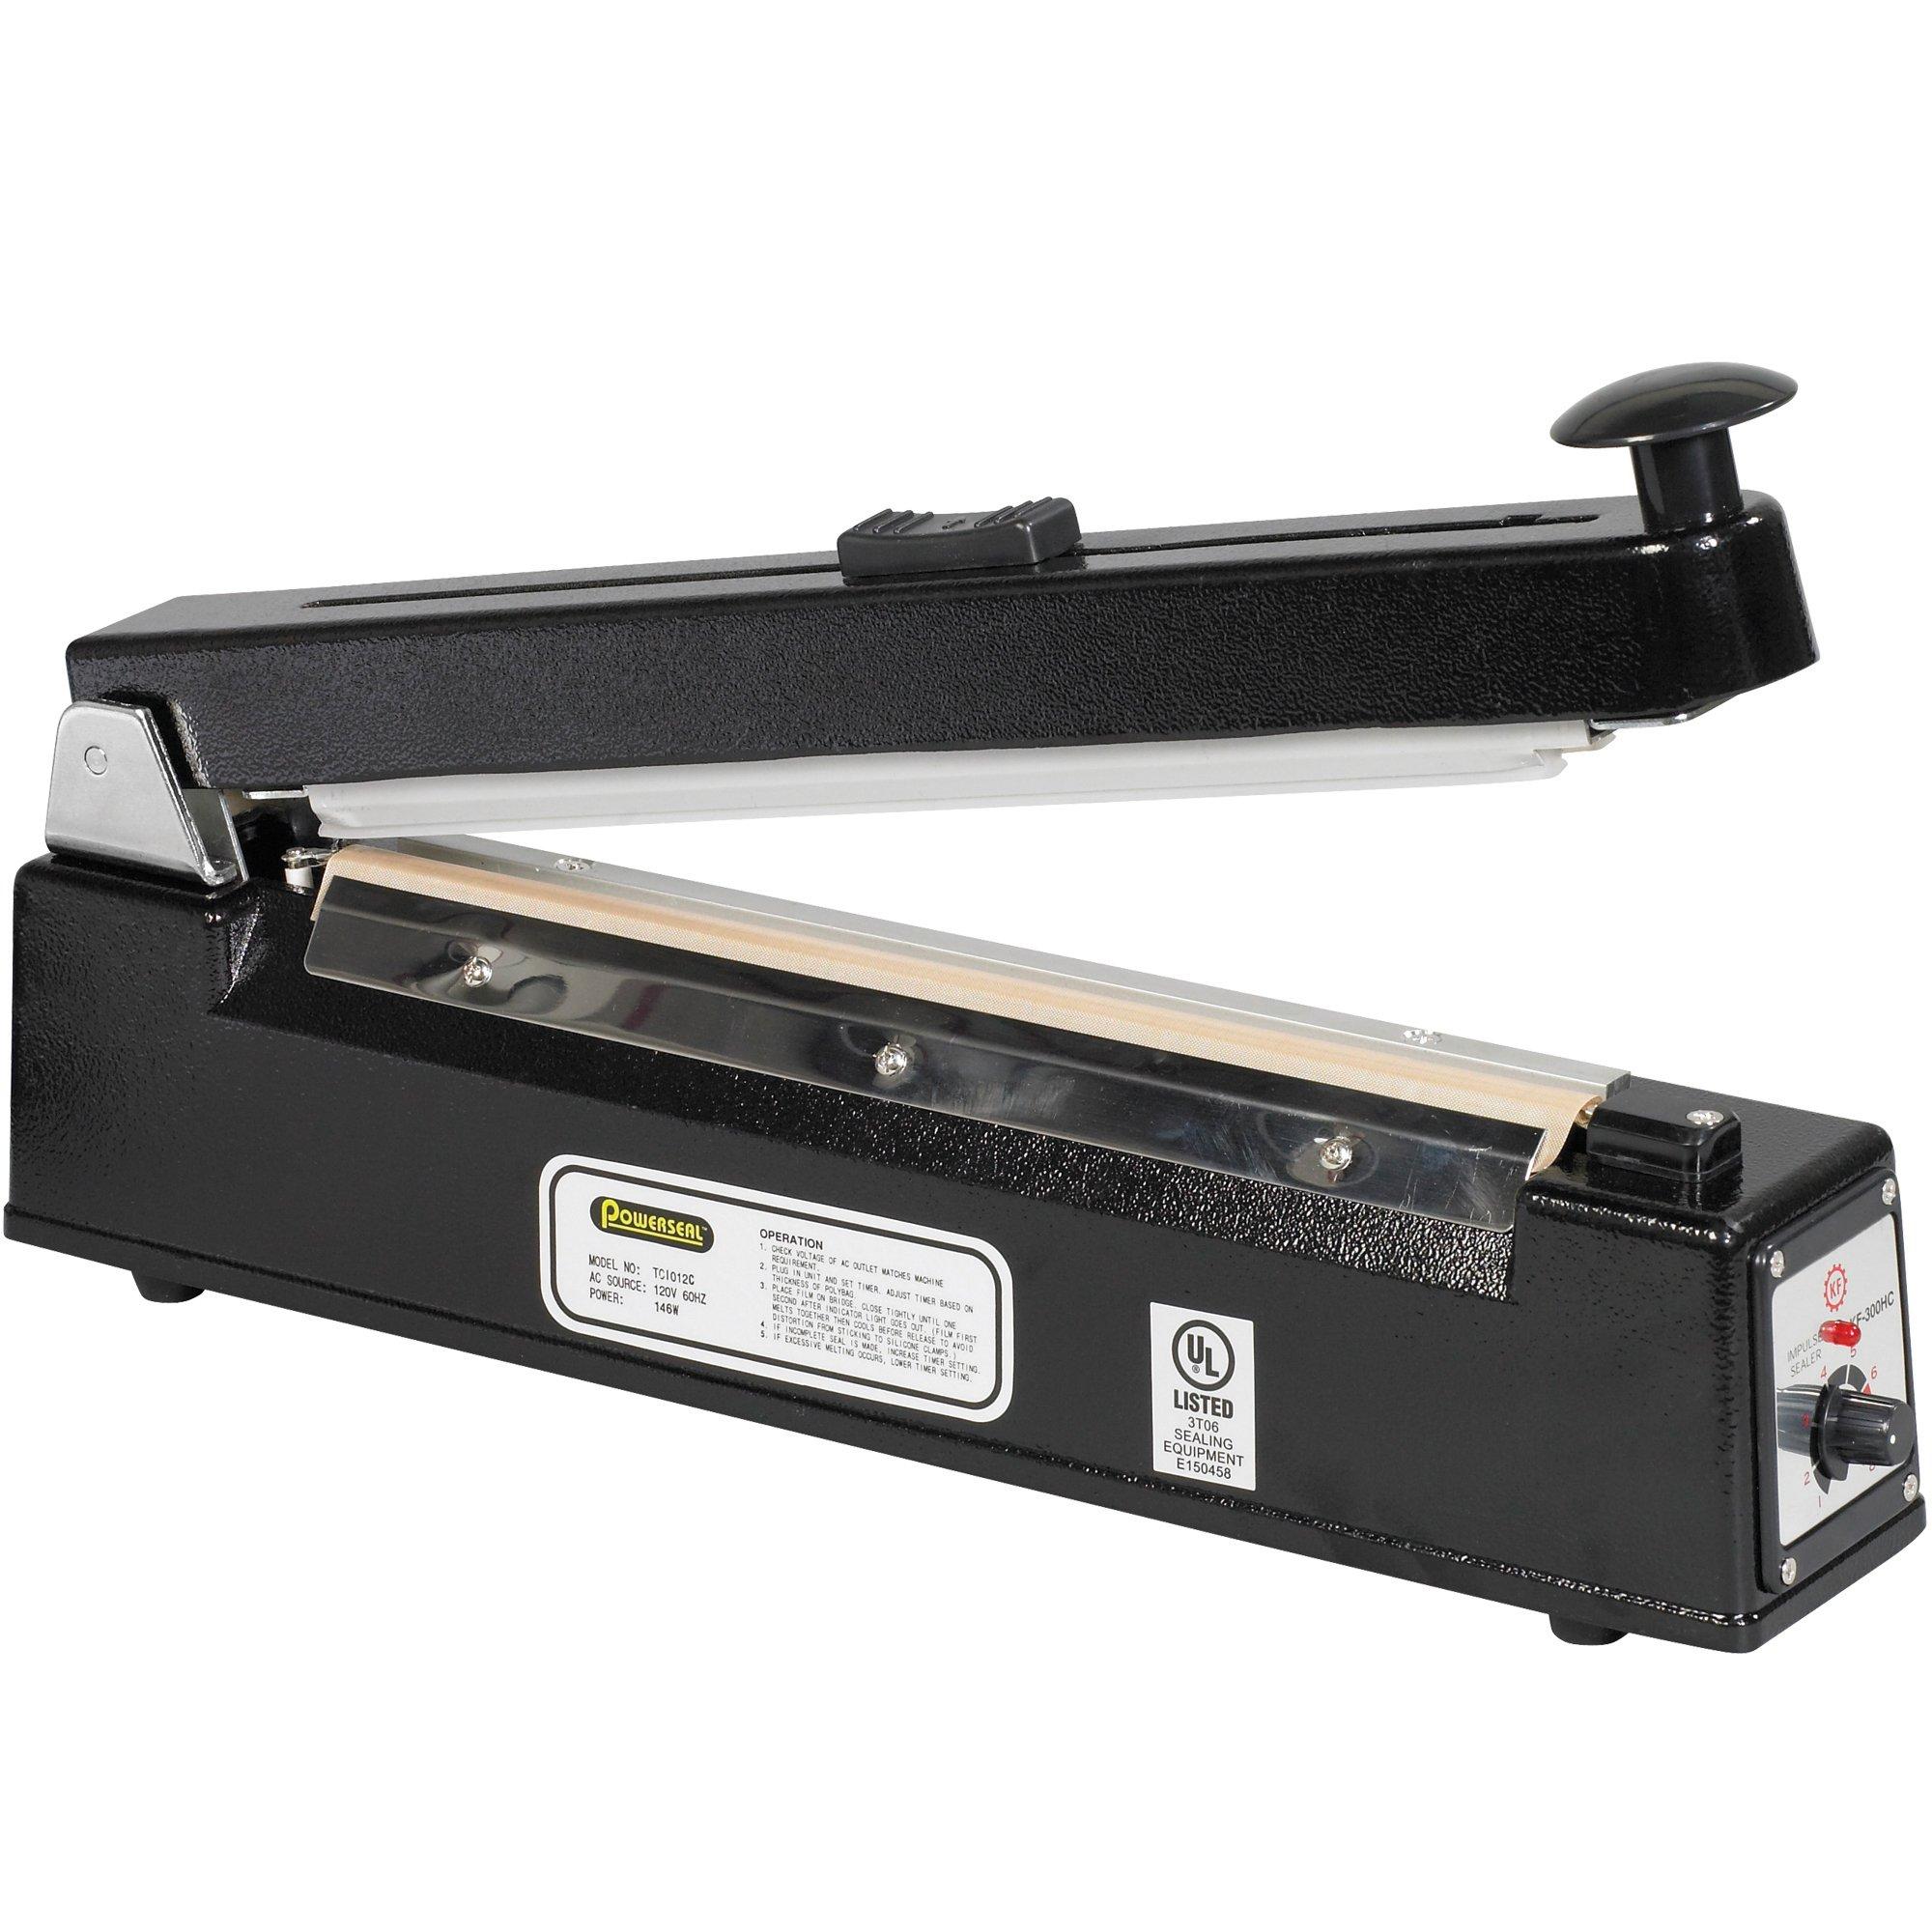 Box Partners Powerseal 12'' Impulse Sealer with Cutter (SPBC12)